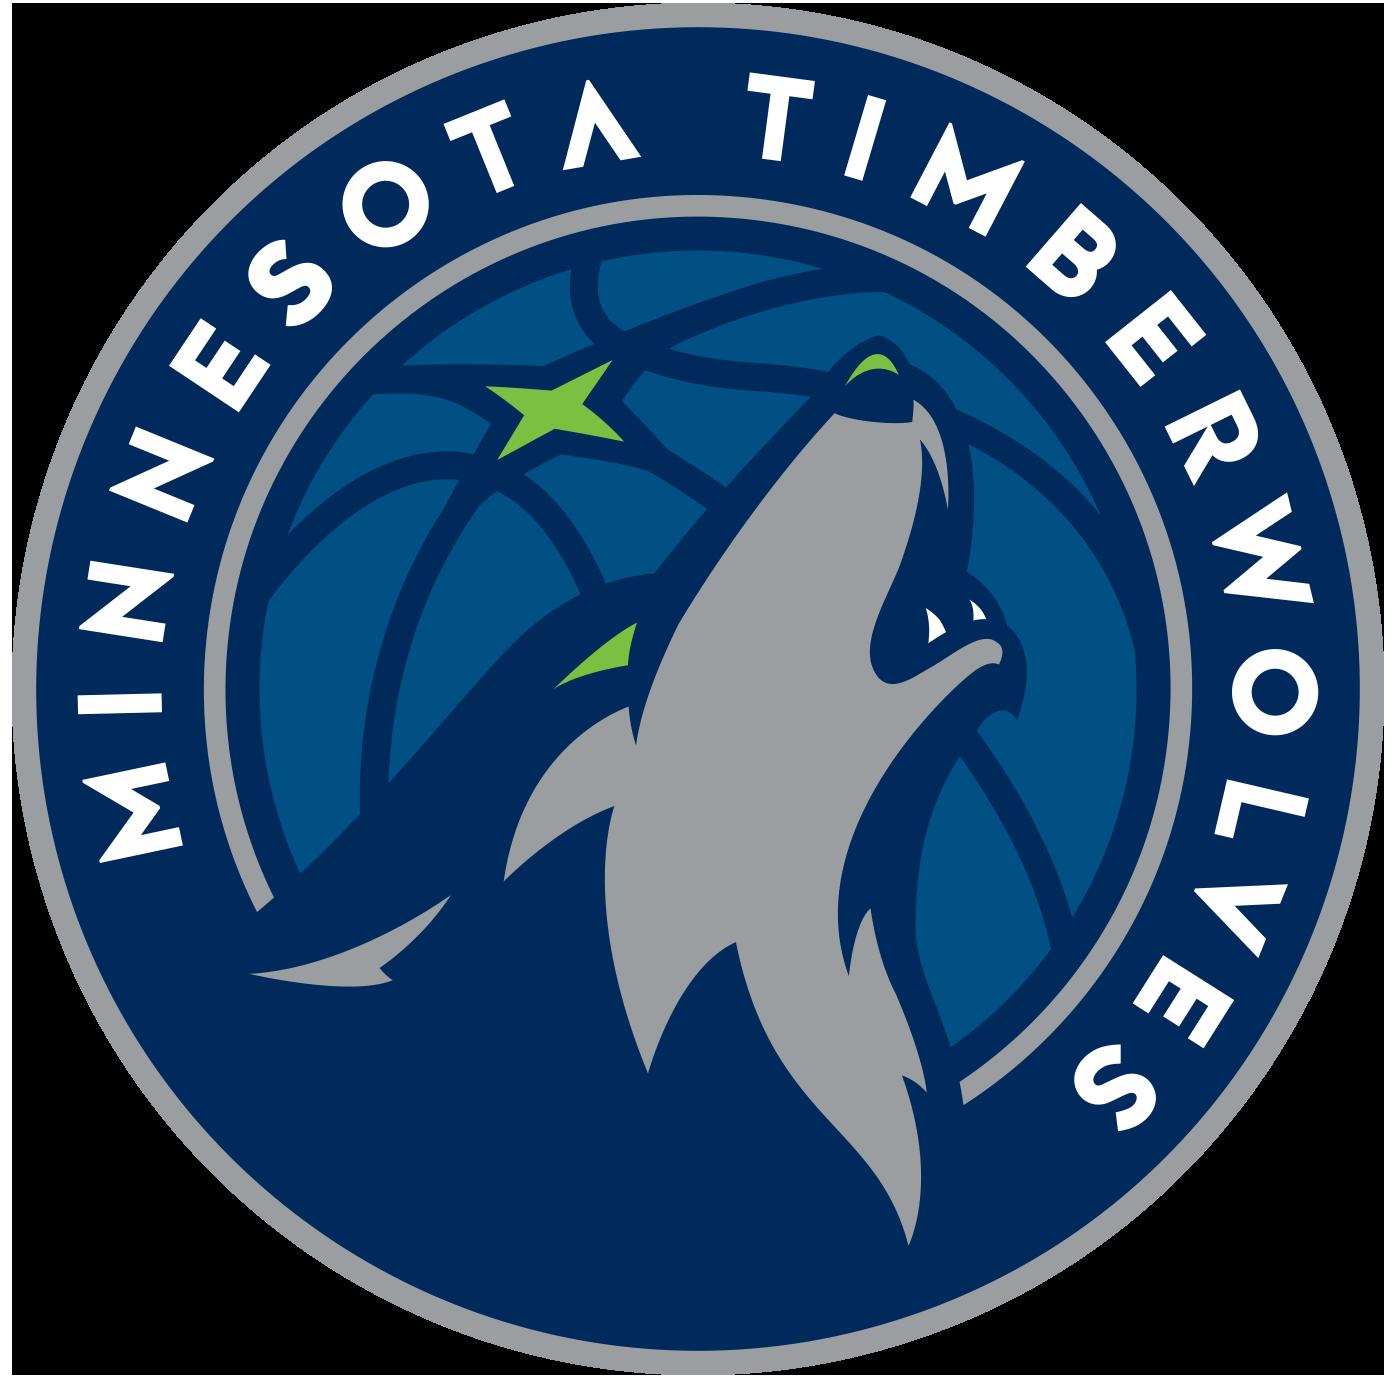 Minnesota Timberwolves Logo Png Transparent Download Minnesota Timberwolves Minnesota Timberwolves Basketball Minnesota